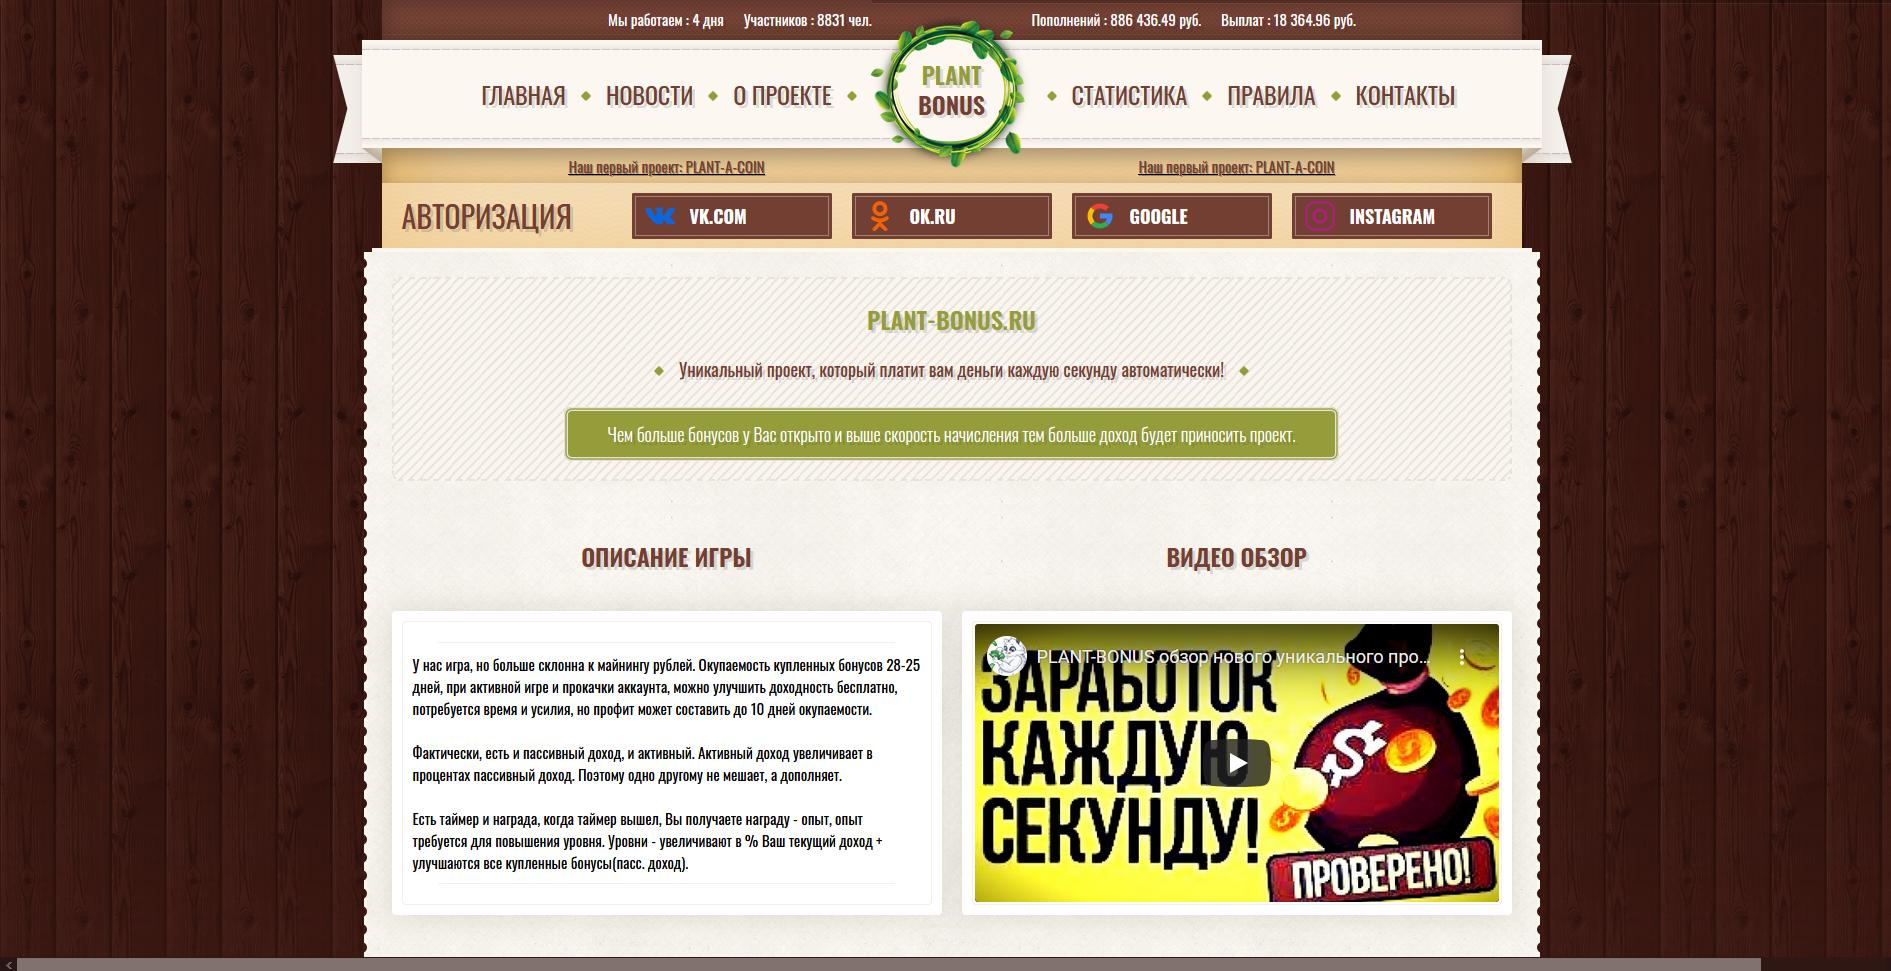 plant bonus - plant-bonus.ru